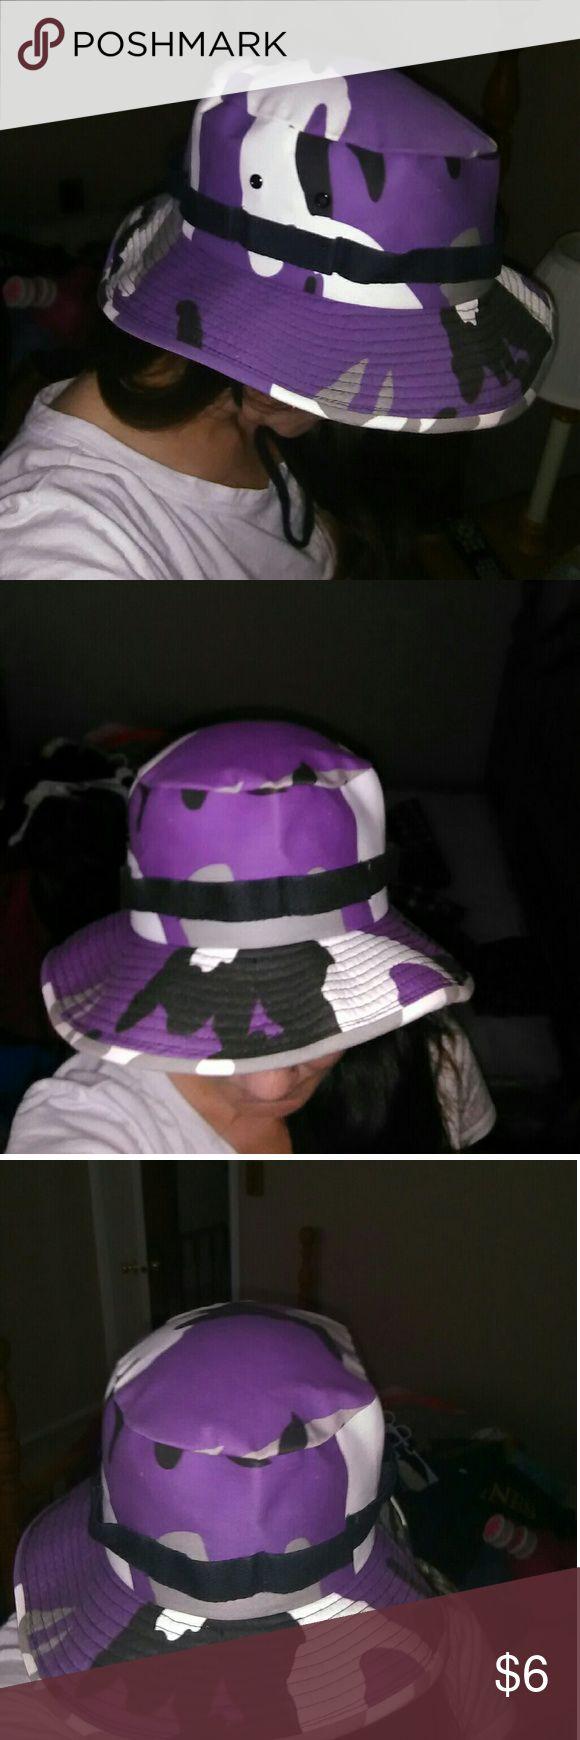 Camouflage bucket hat Women's small purple camo bucket hat. Accessories Hats